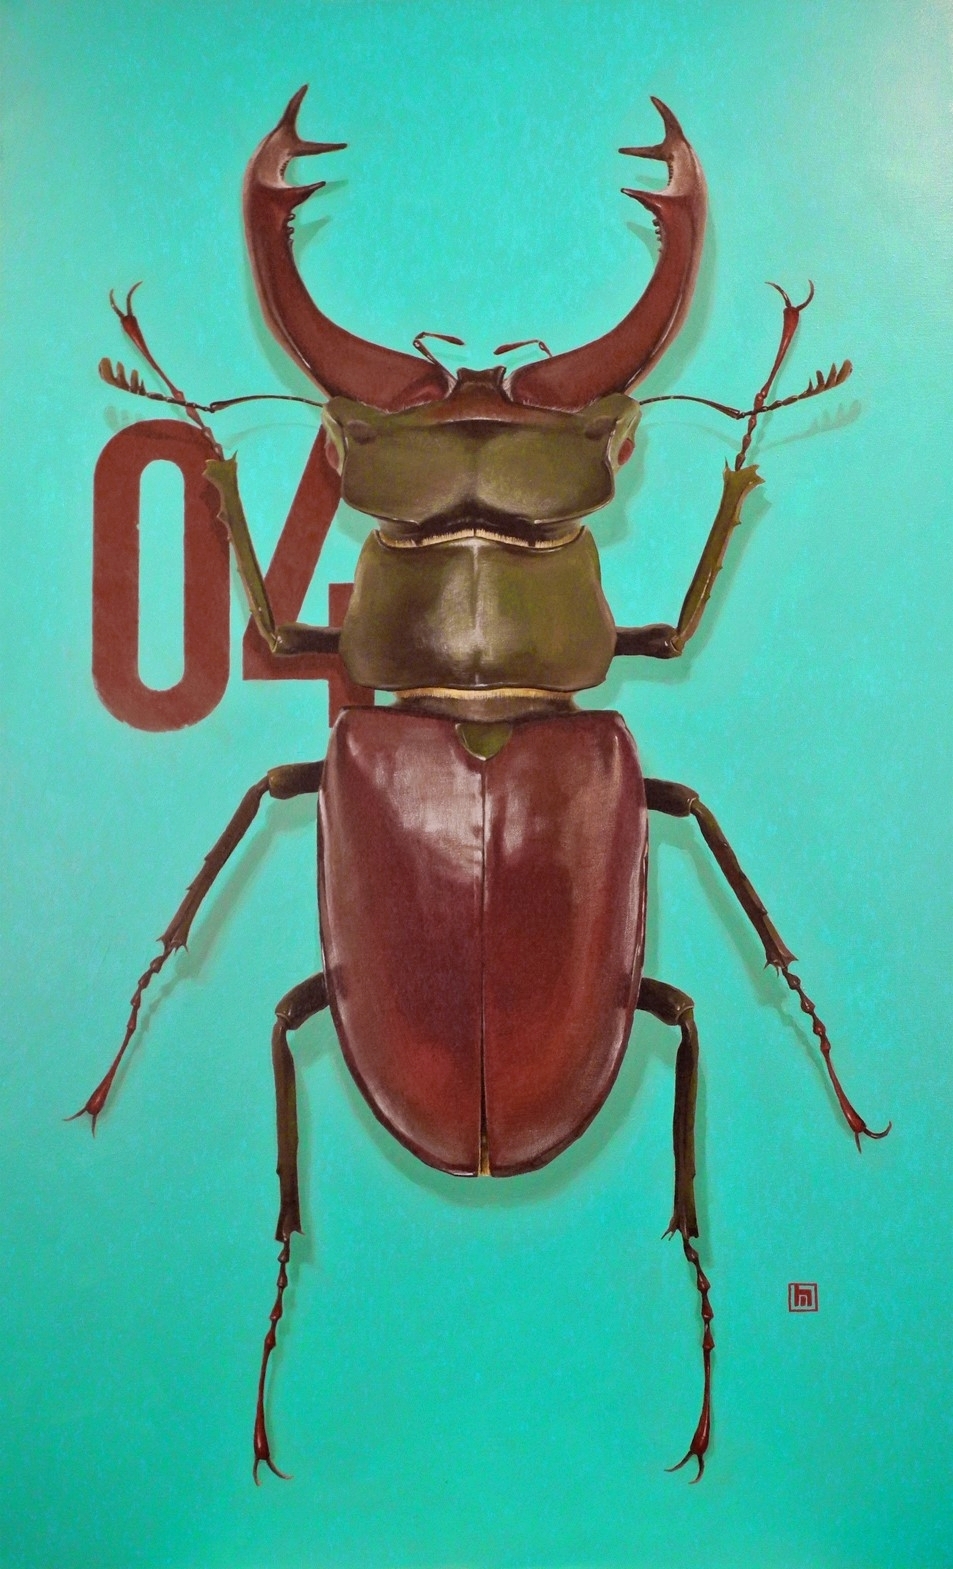 #4 Stag Beetle